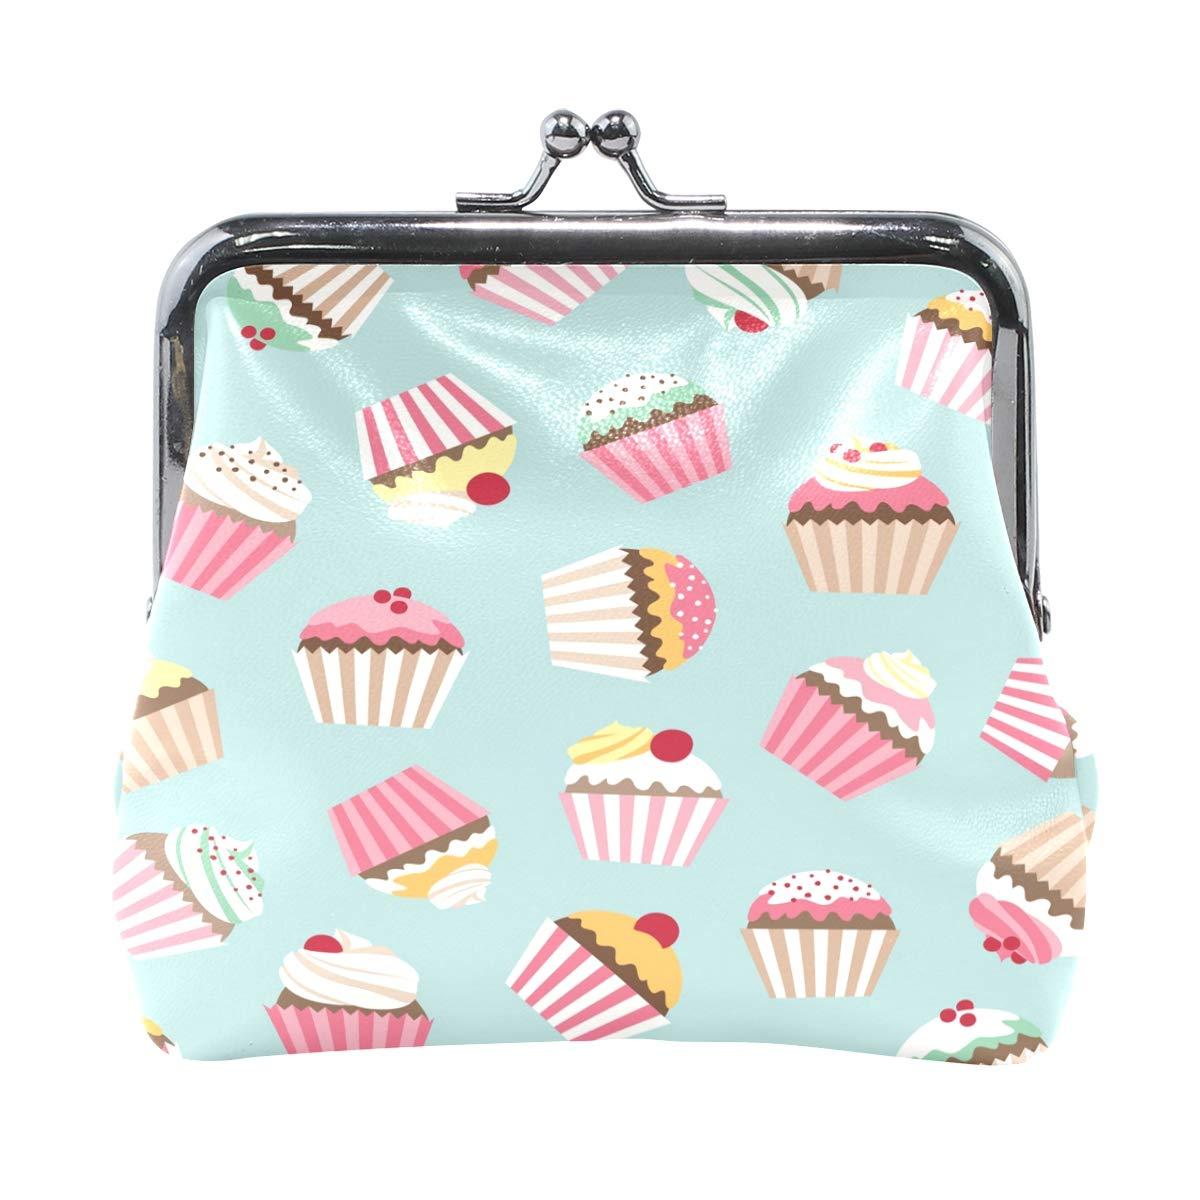 Women Wallet Purse Cute Sweet Cupcake Retro Clutch Bag Leather